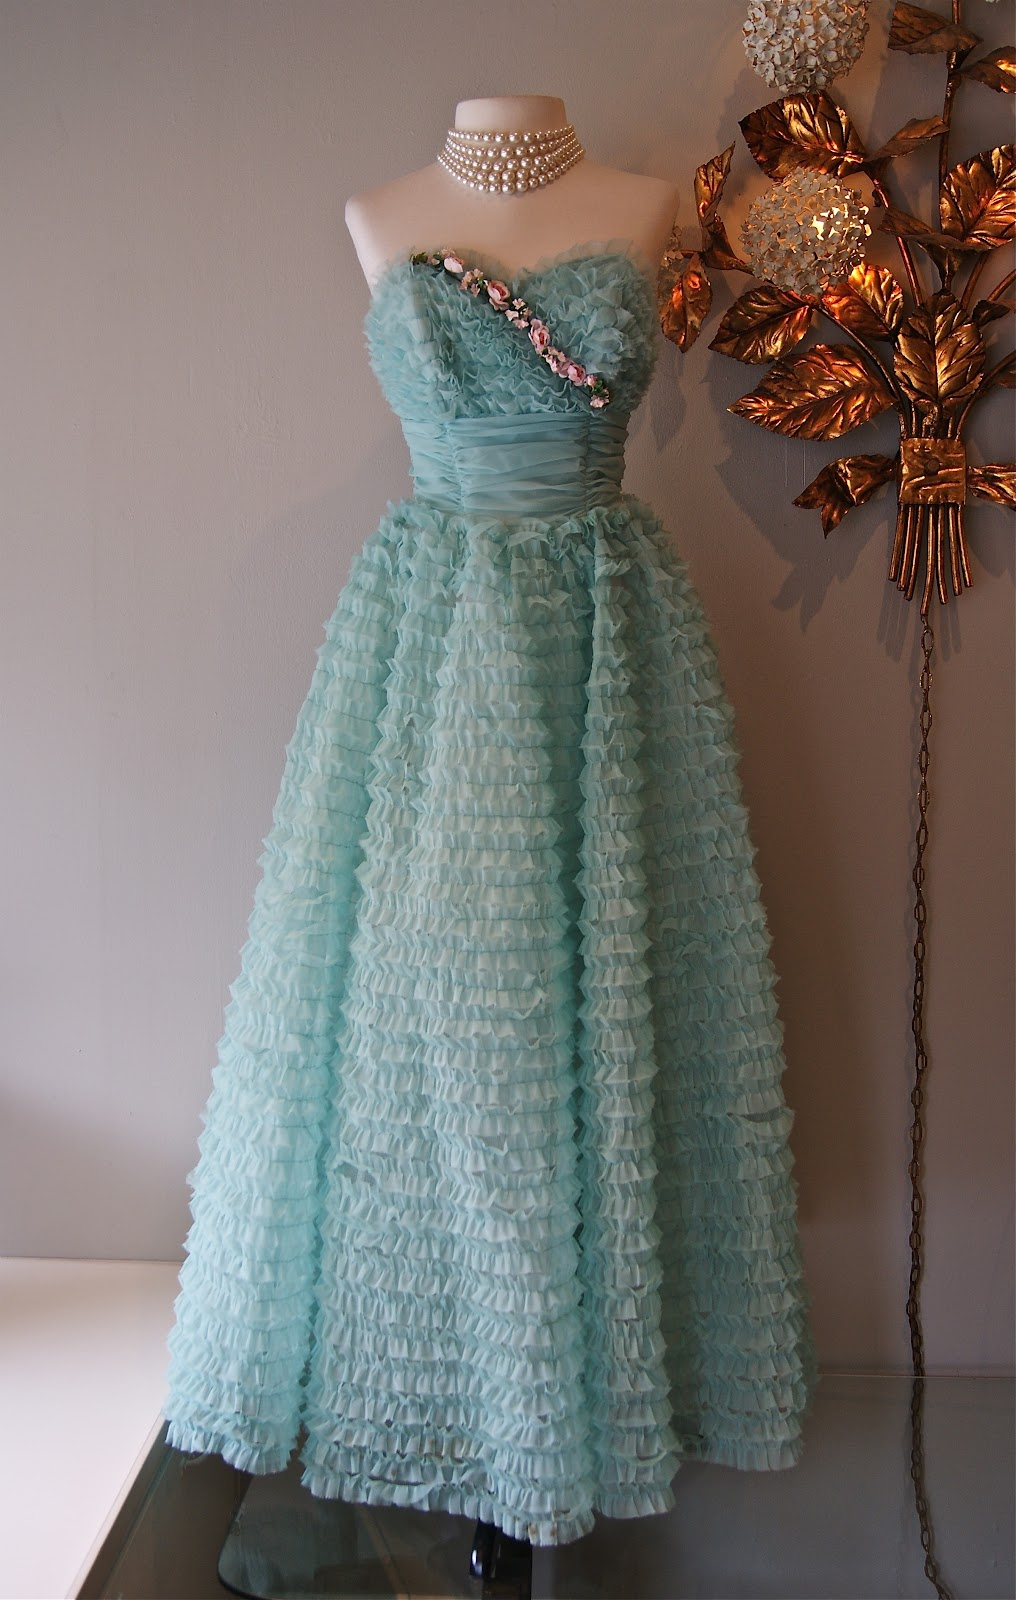 Xtabay Vintage Clothing Boutique - Portland, Oregon: Xtabay Prom ...